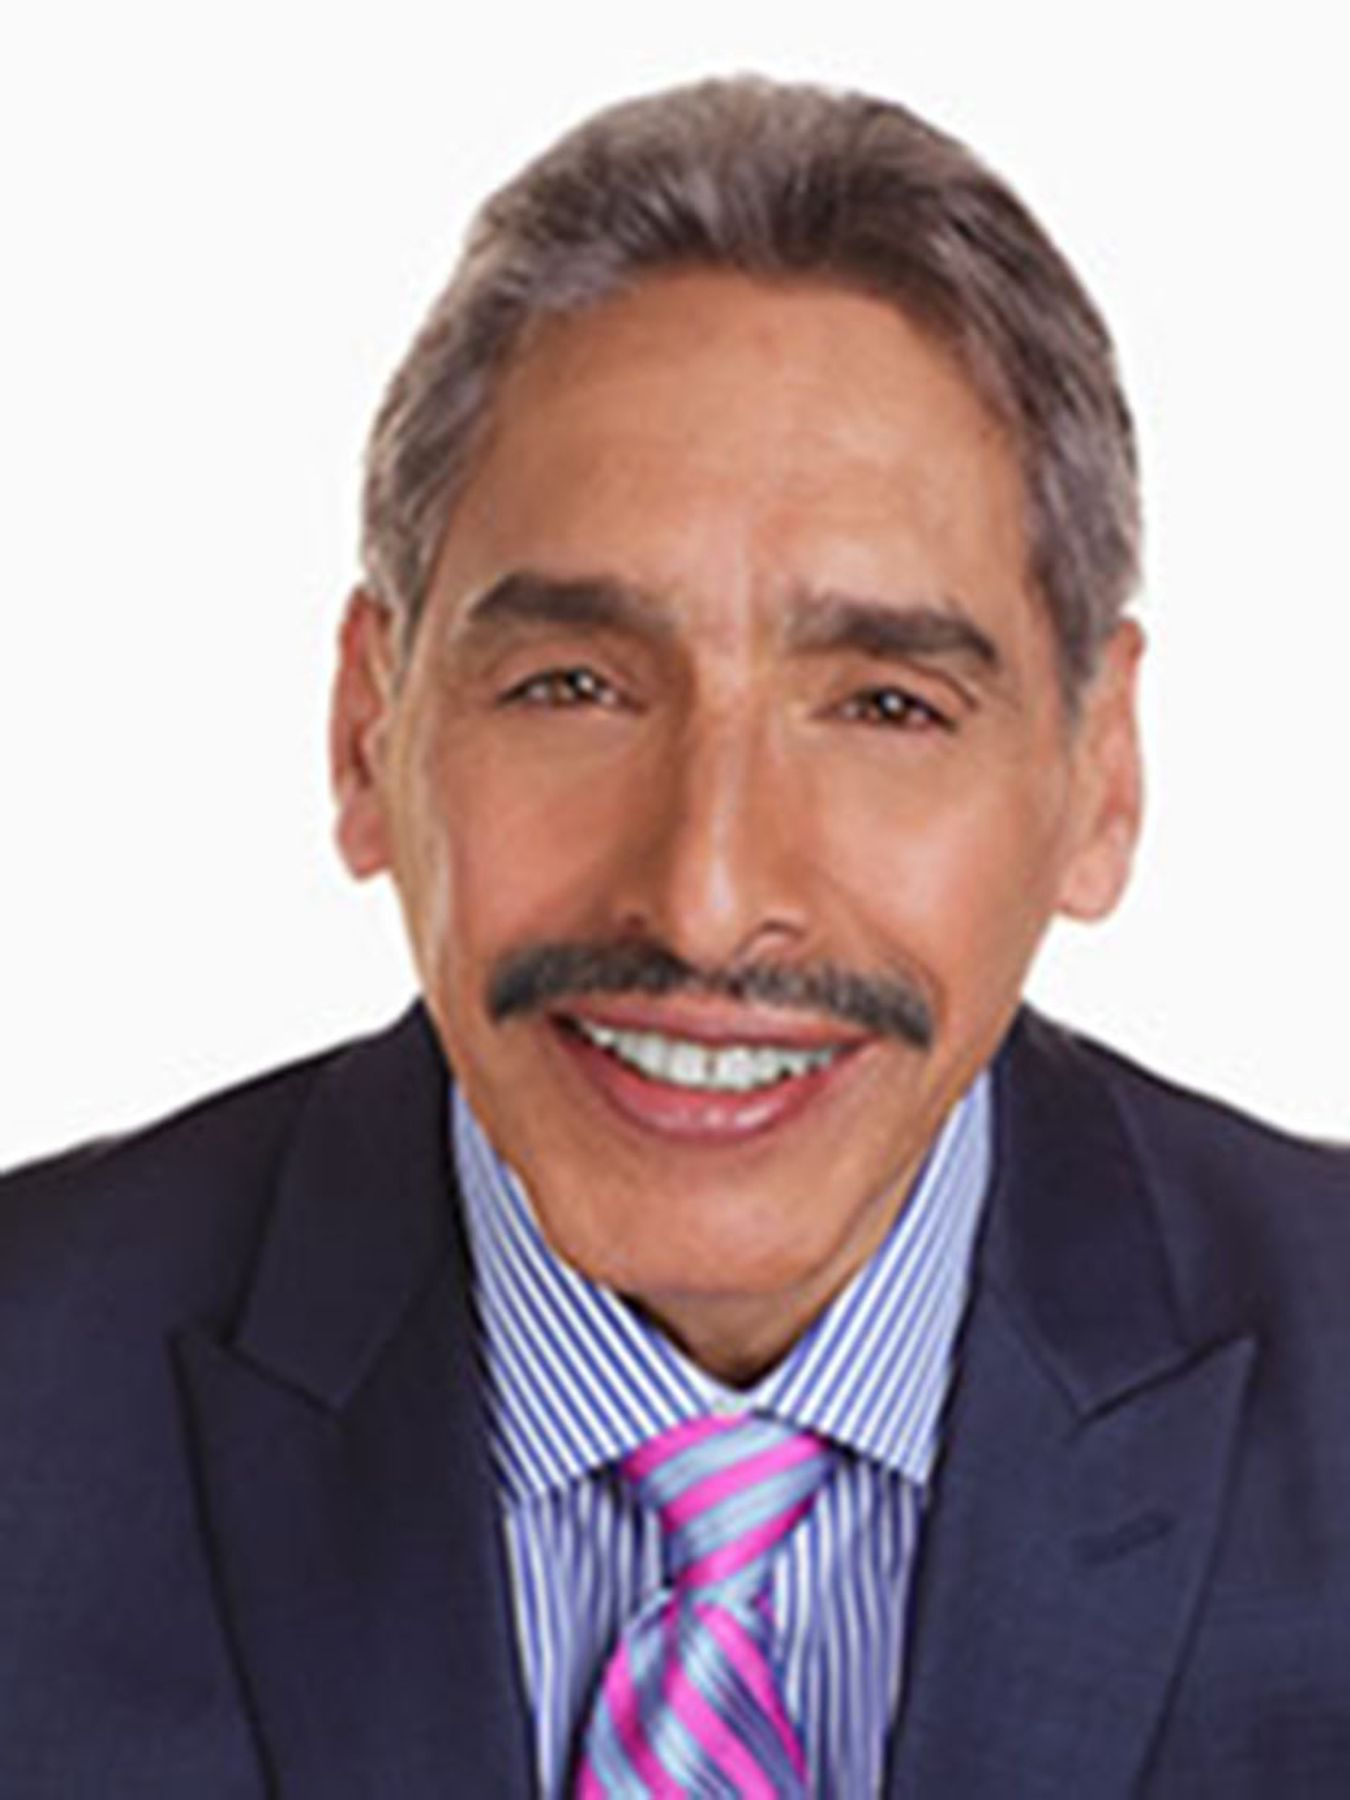 Benjamin Morales